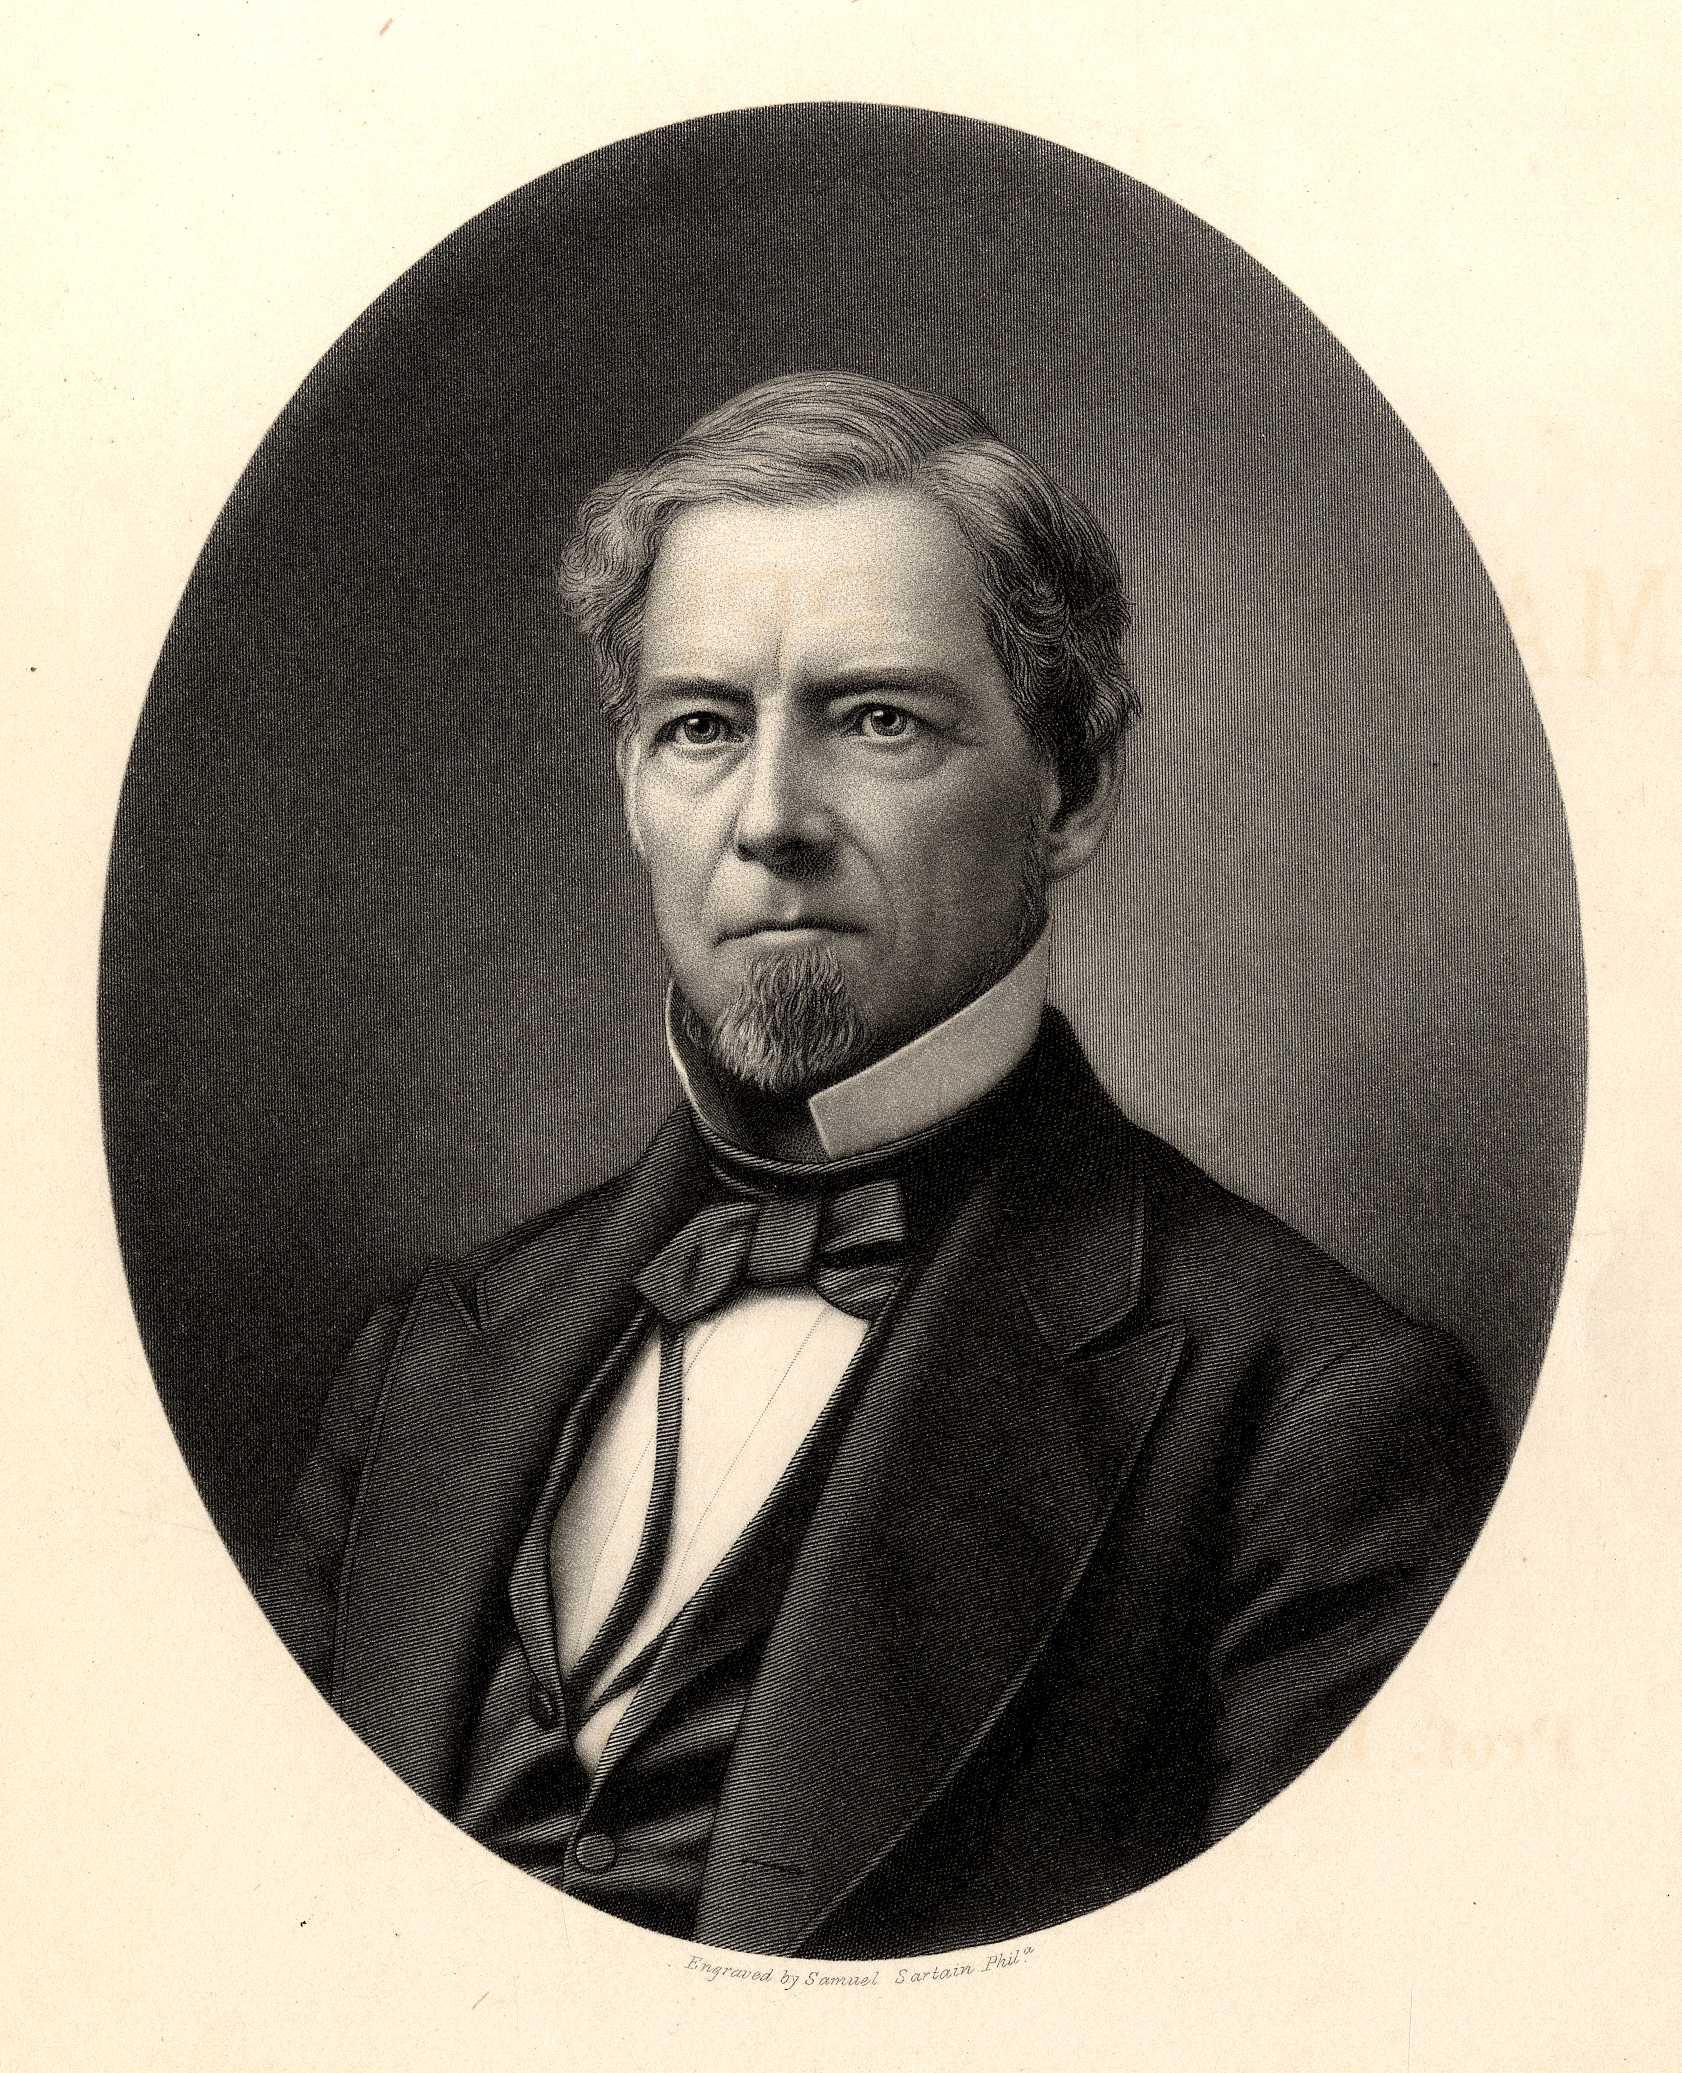 Lyman C. Draper Engraving